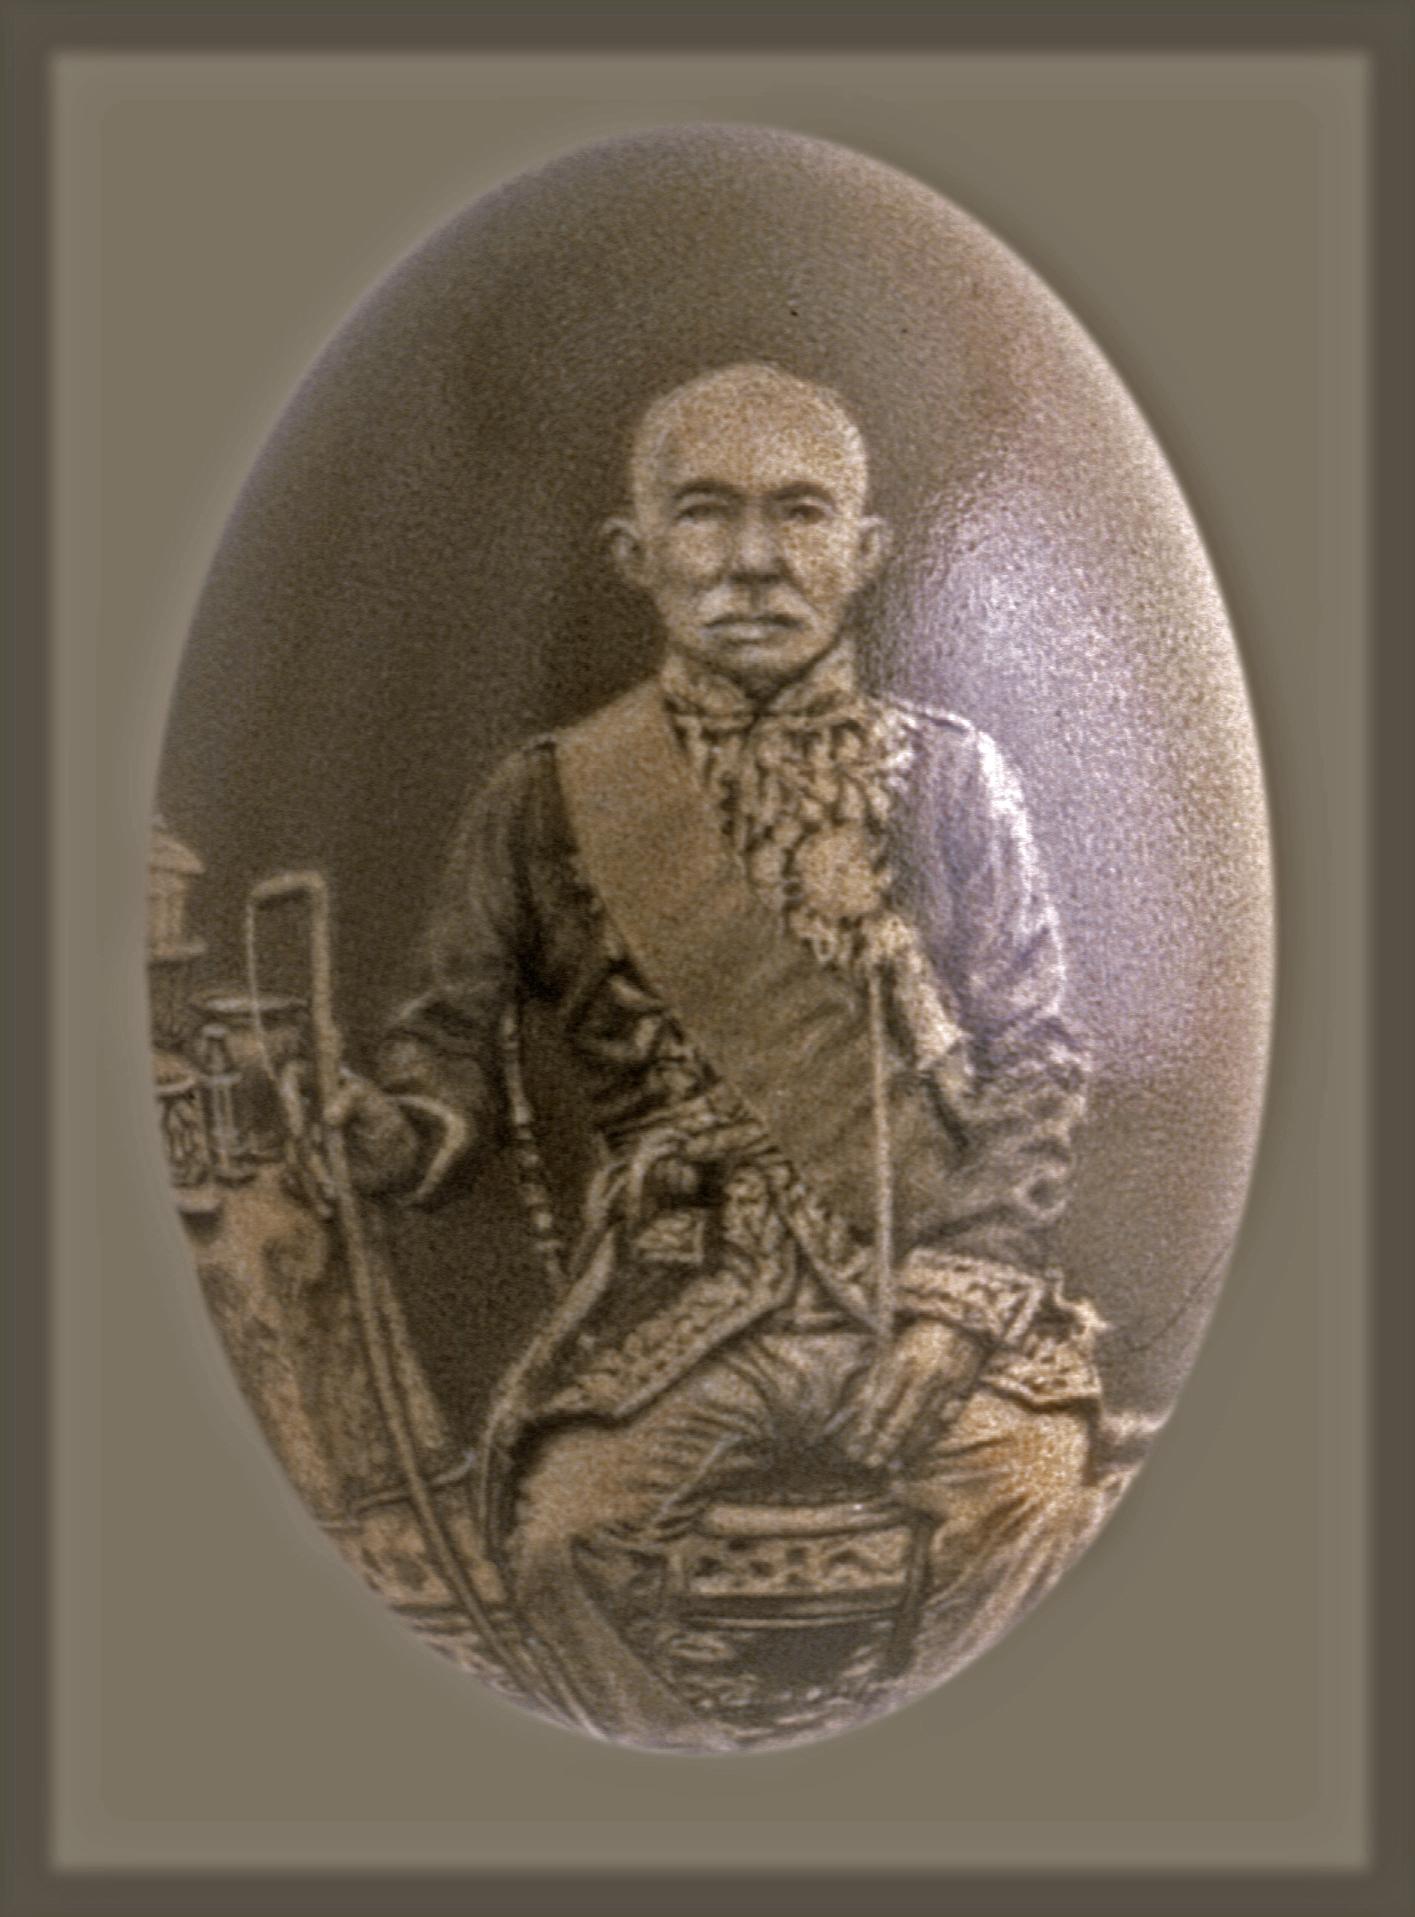 Thailand's King Rama IV